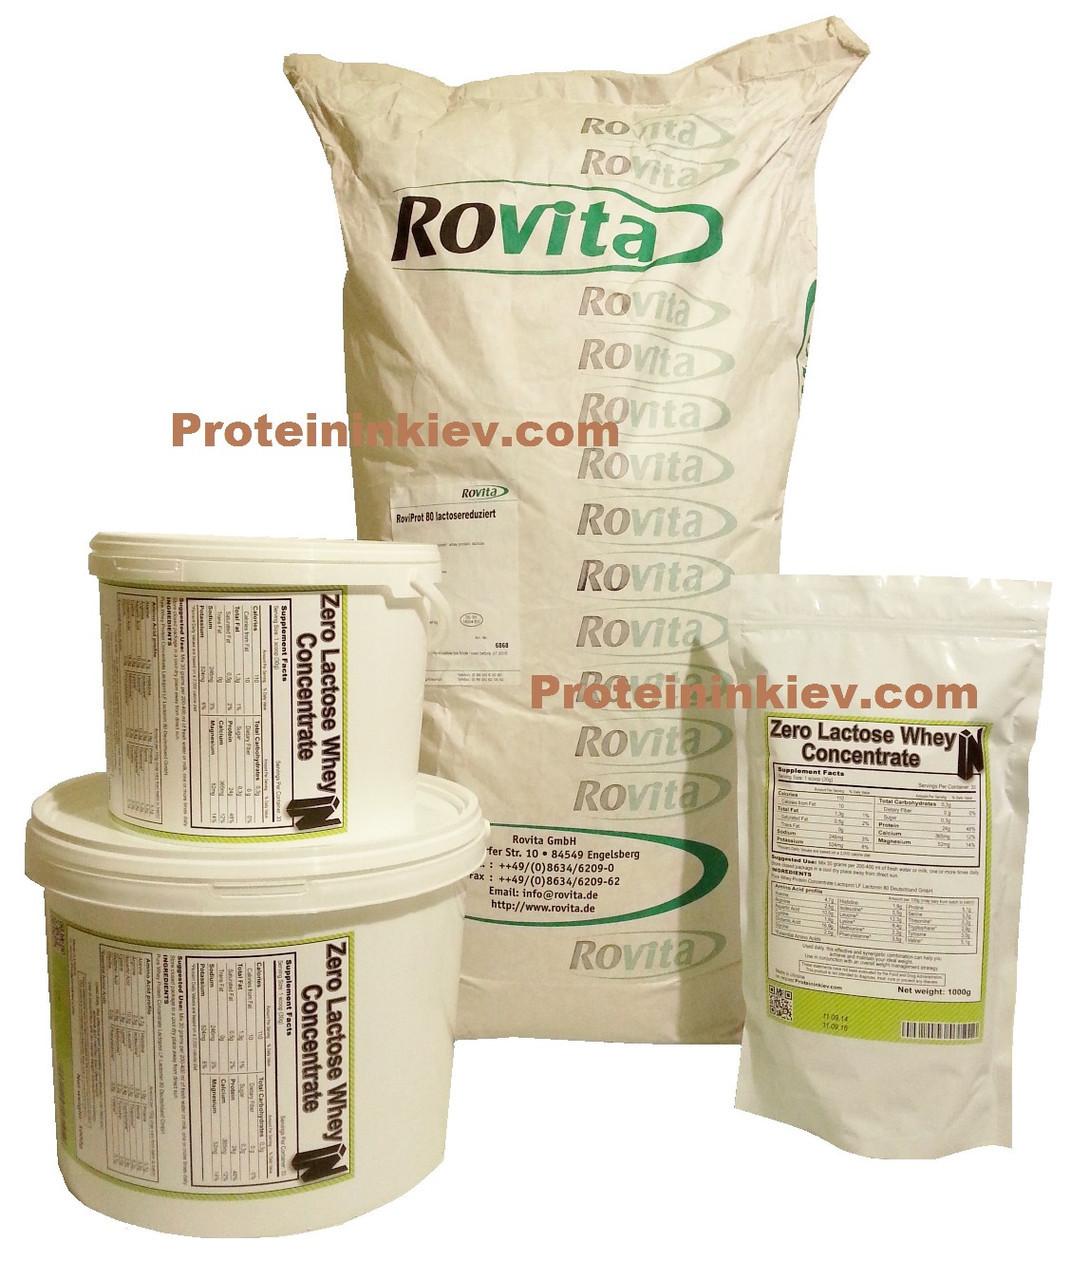 Rovita Roviprot 80 LF Proteininkiev- безлактозный немецкий протеин на развес